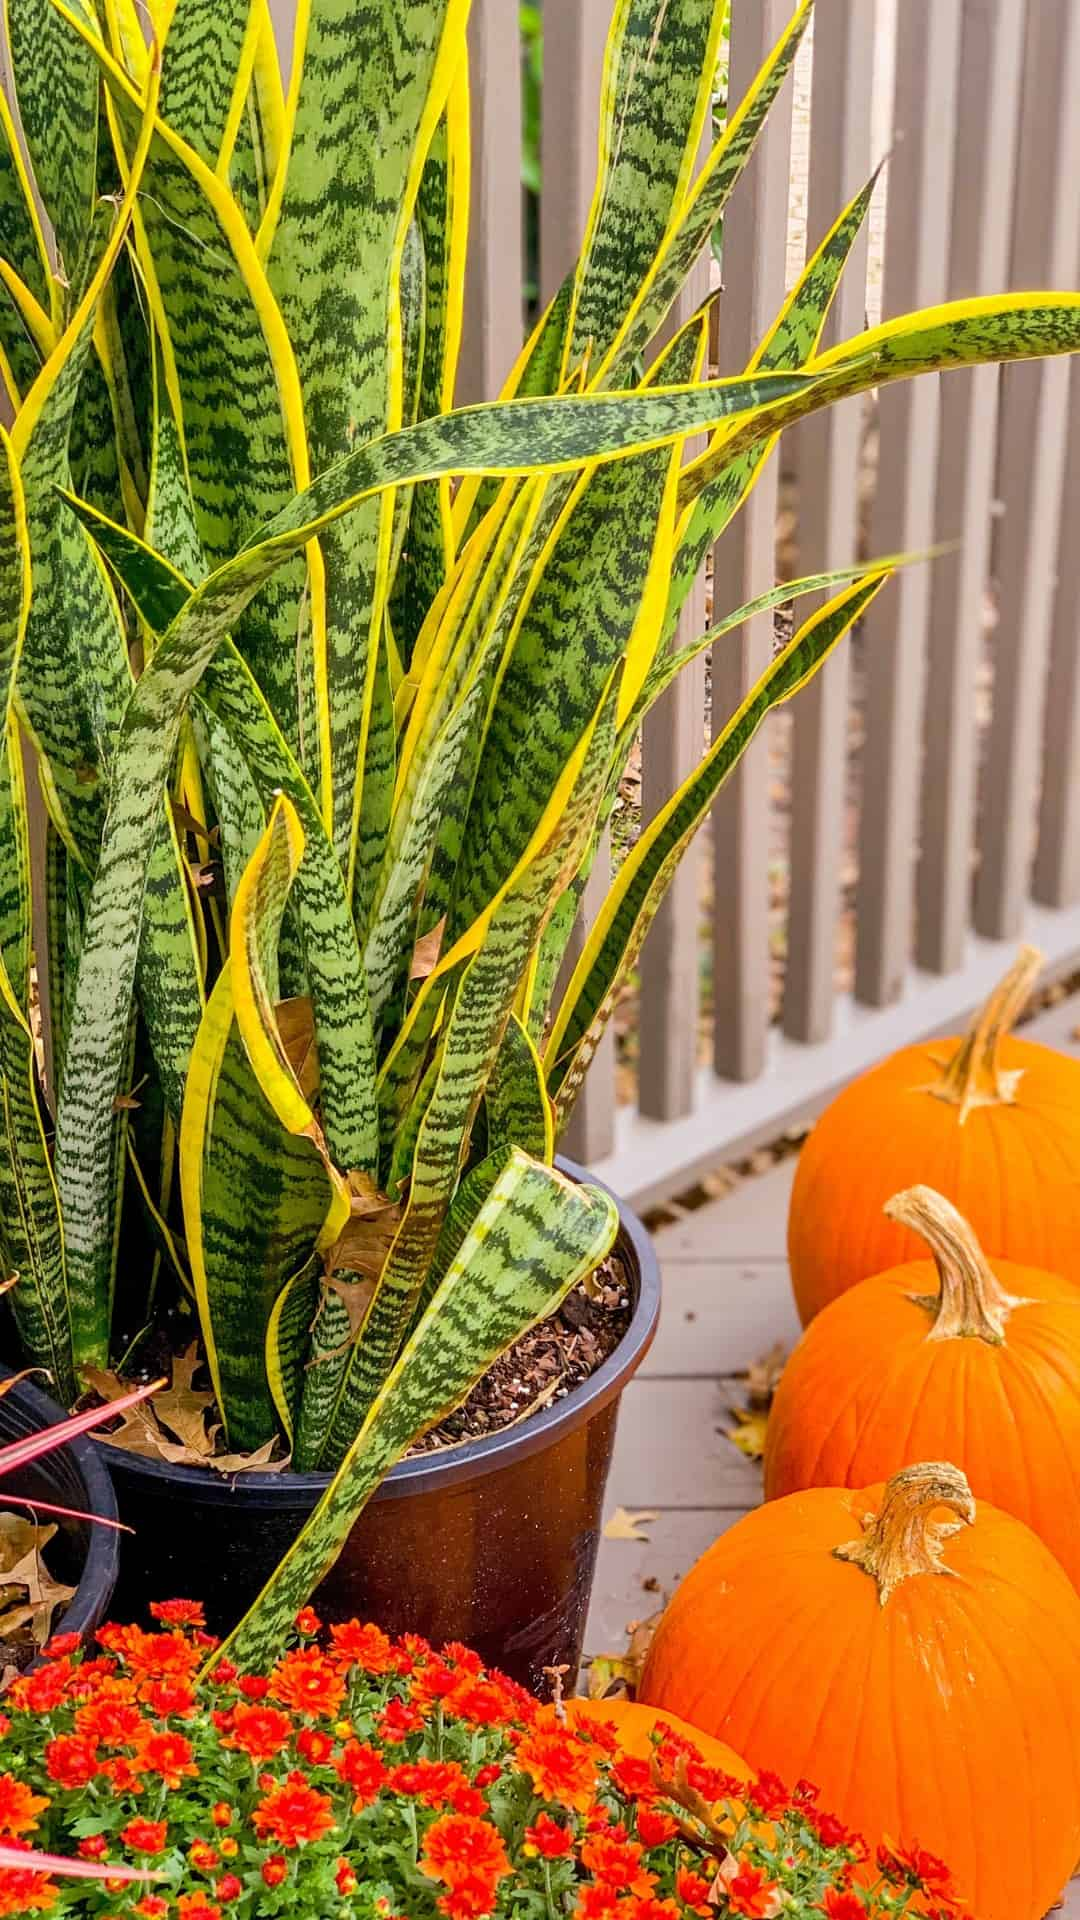 Autumn Wallpaper iPhone Aesthetic Snake Plants